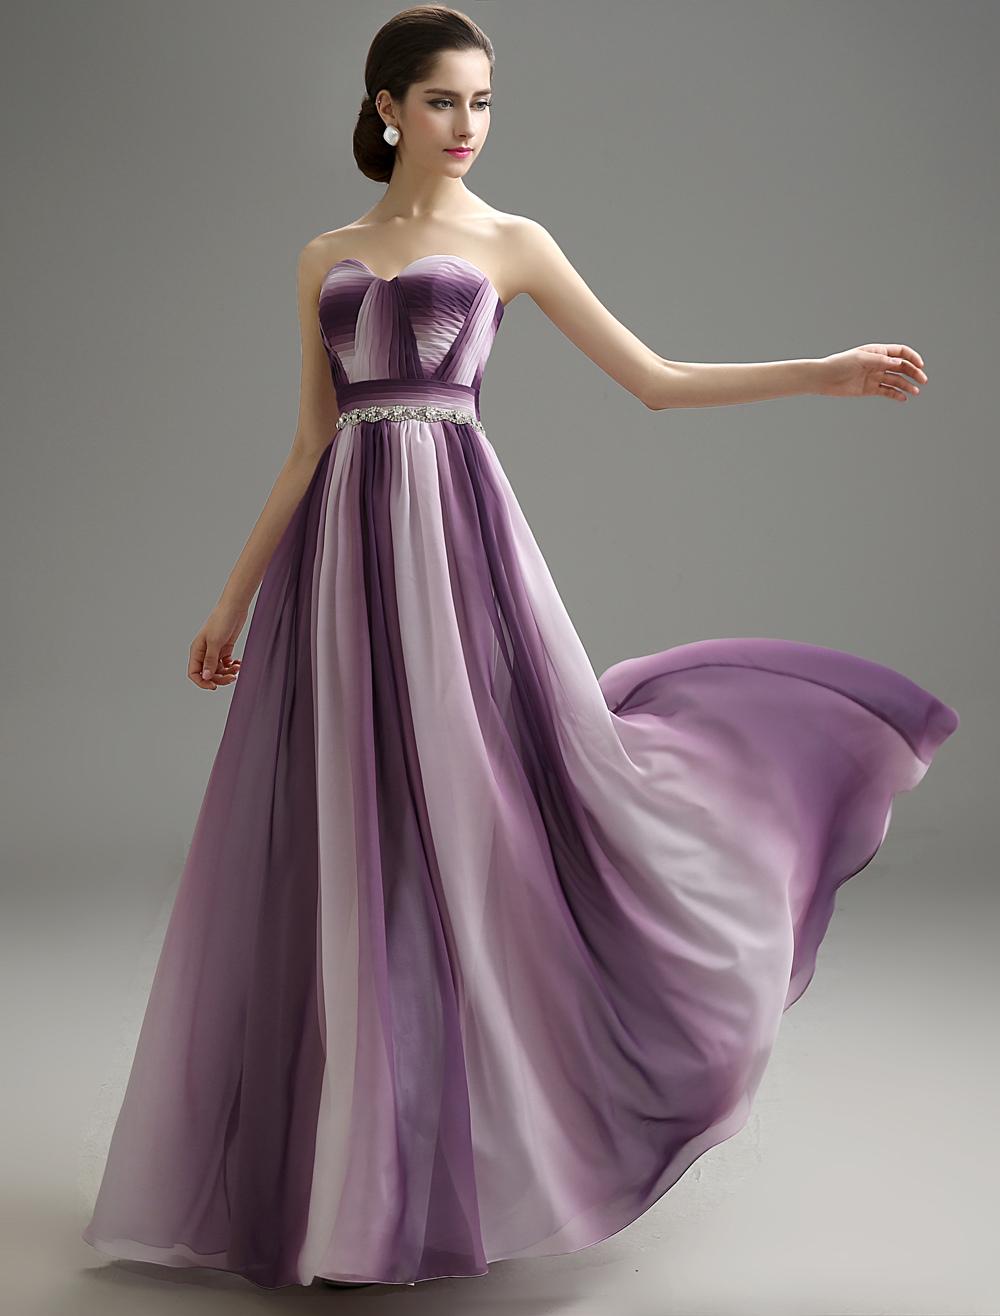 Ombrea Strapless Pleated Chiffon Prom Dress (Wedding Prom Dresses) photo